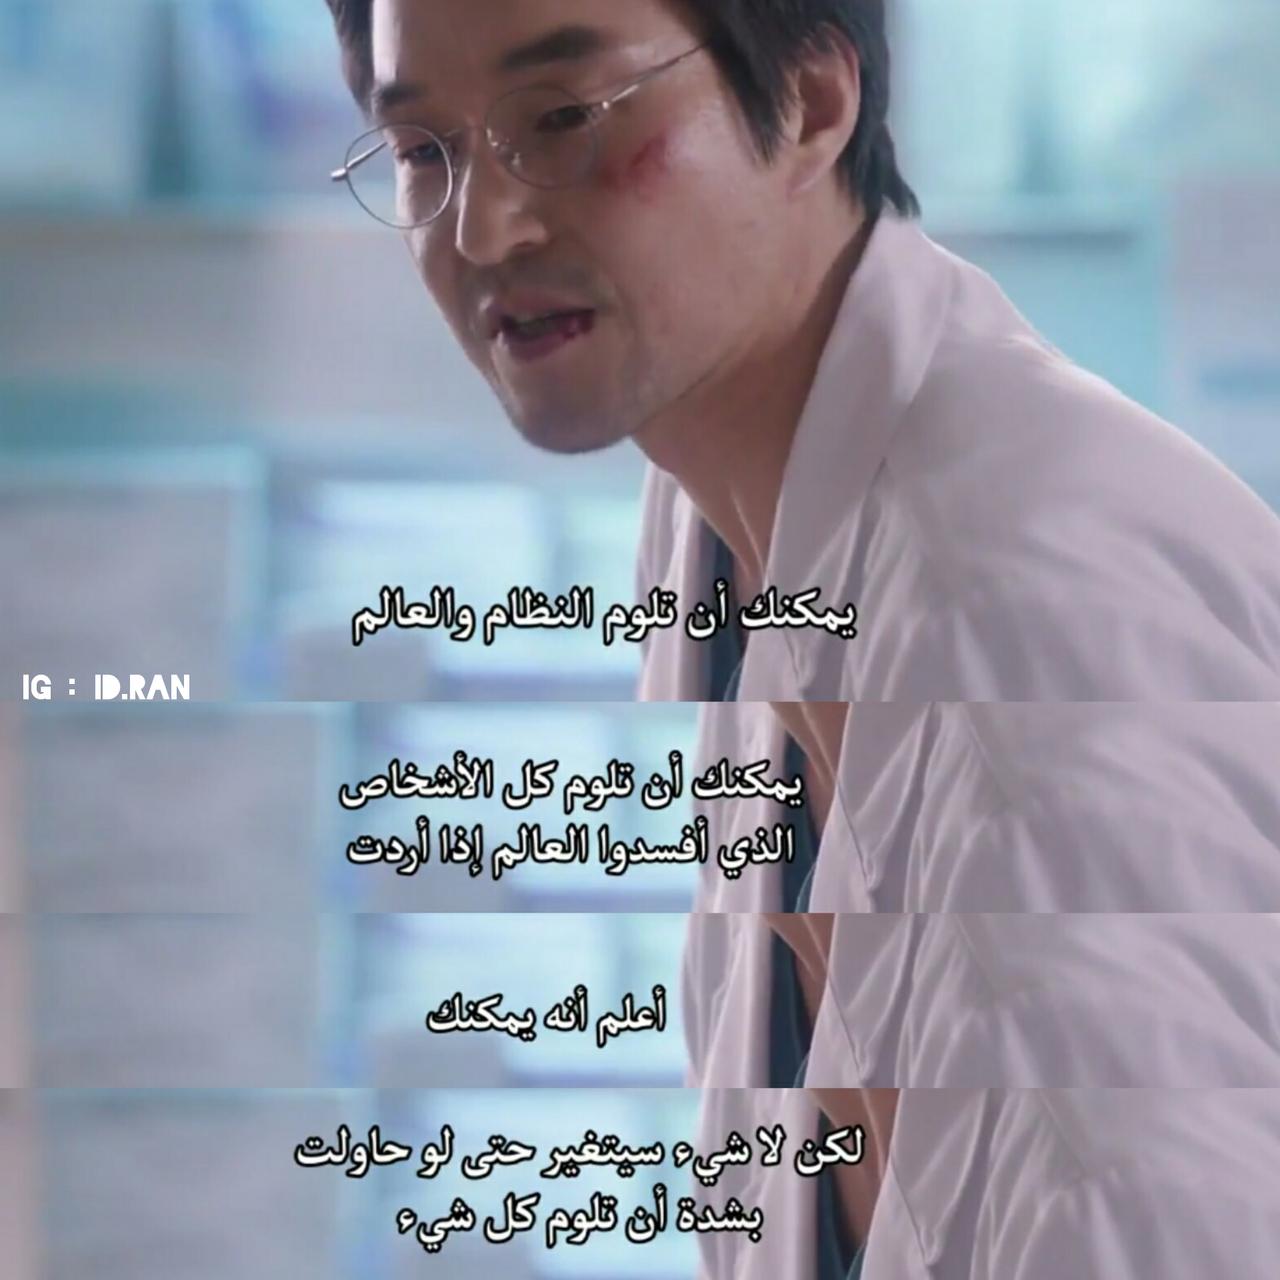 Korean Drama, مسلسﻻت كورية, and اقتباسات كورية image